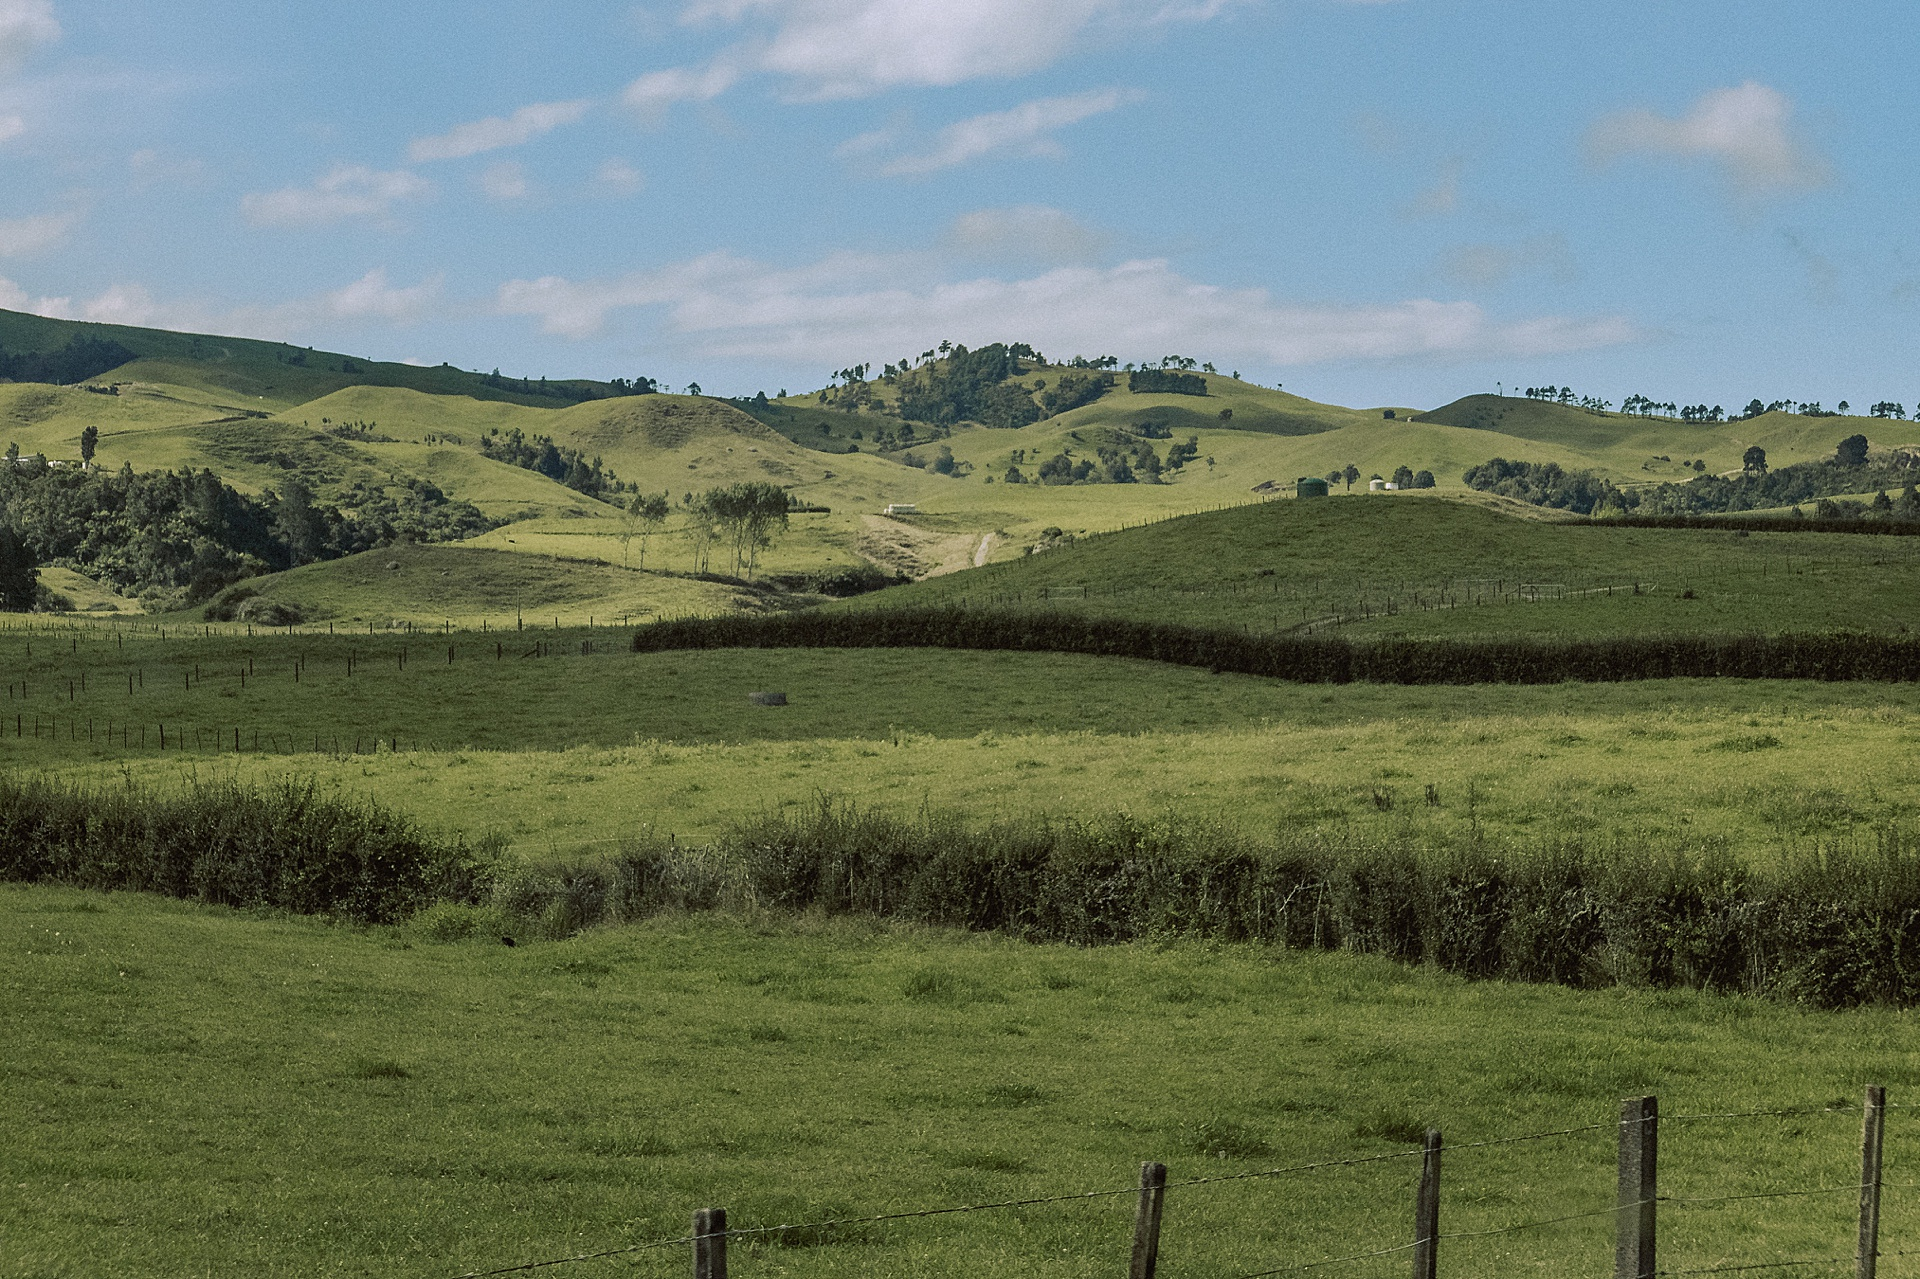 family-roadtrip-neuseeland-travelnewzealand-danielzube_0668.jpg